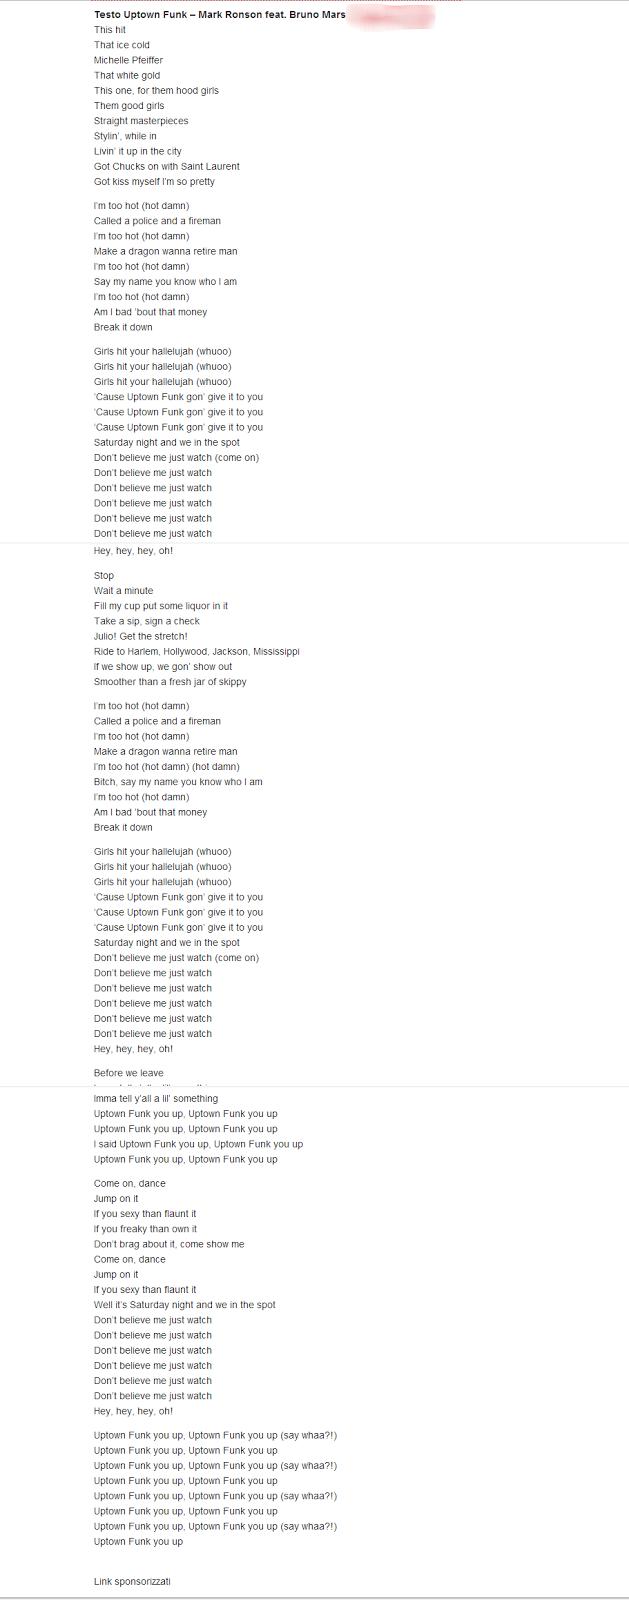 testo traduzione Uptown Funk Mark Ronson ft. Bruno Mars lyrics